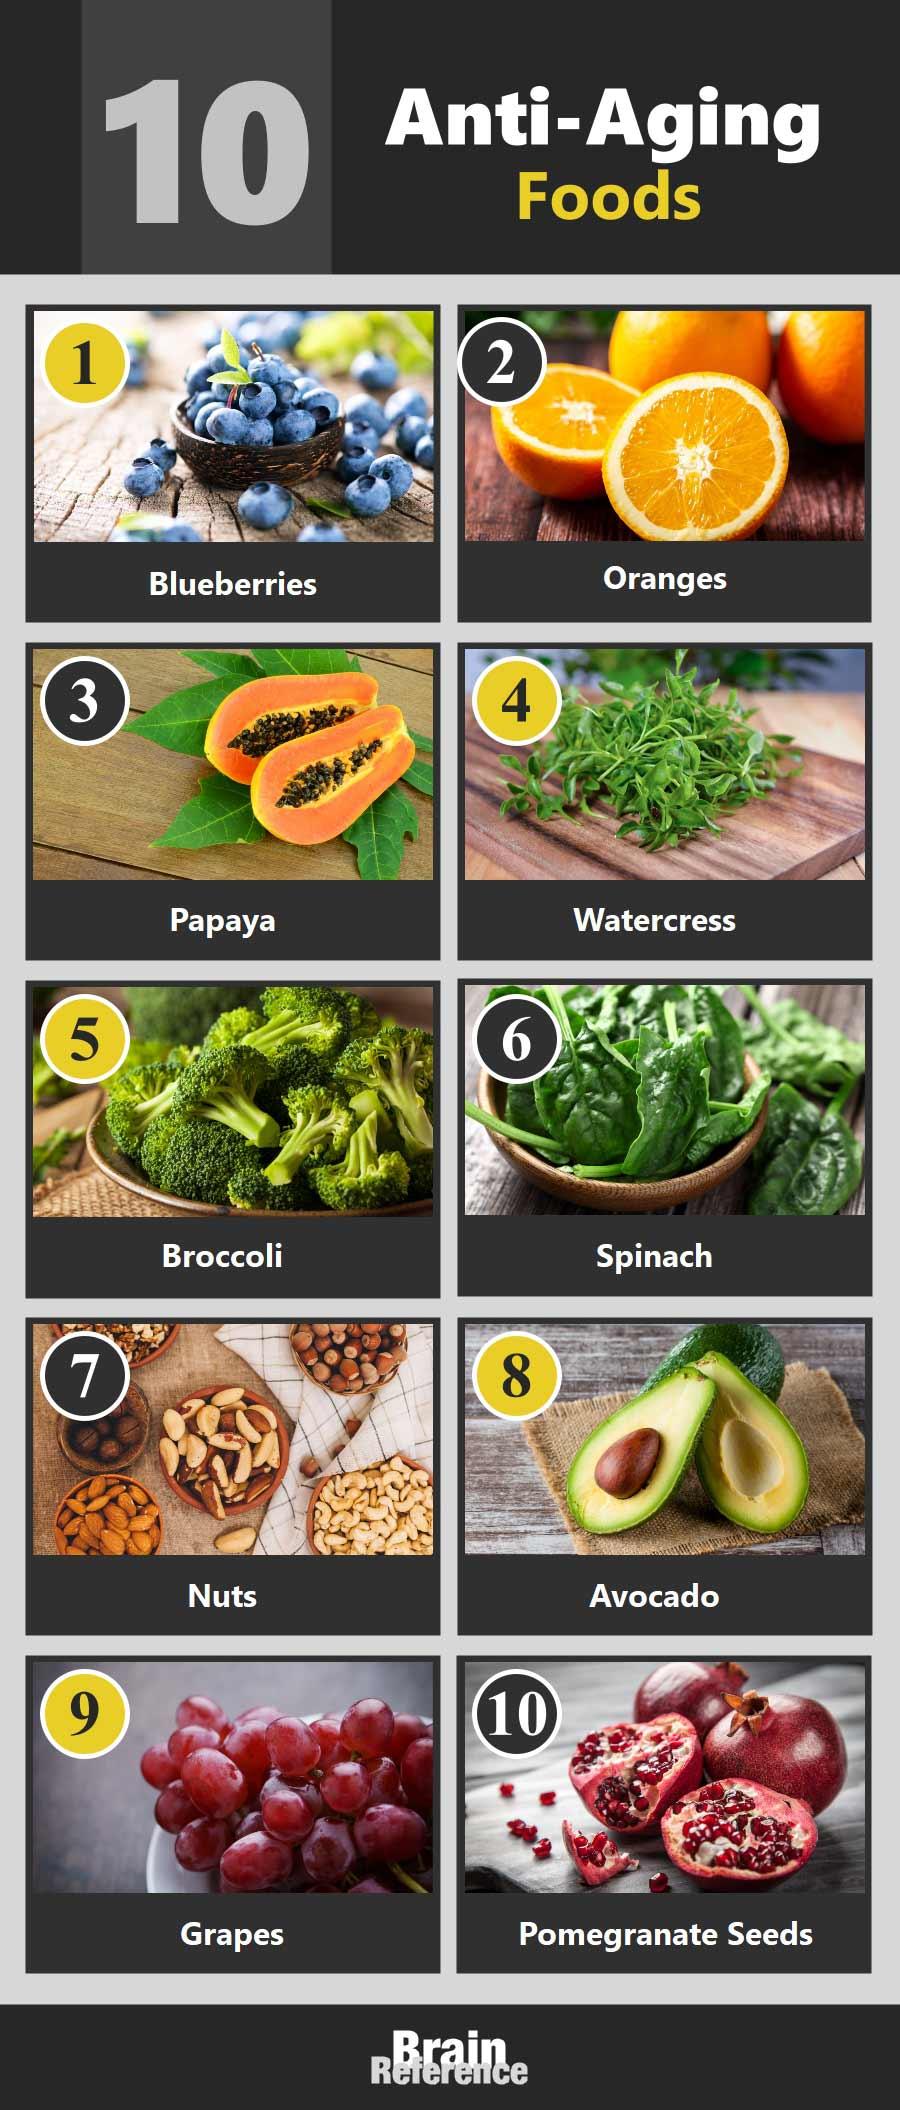 SeroVital-Advanced-Sanmedica-International-Anti-Aging-Foods